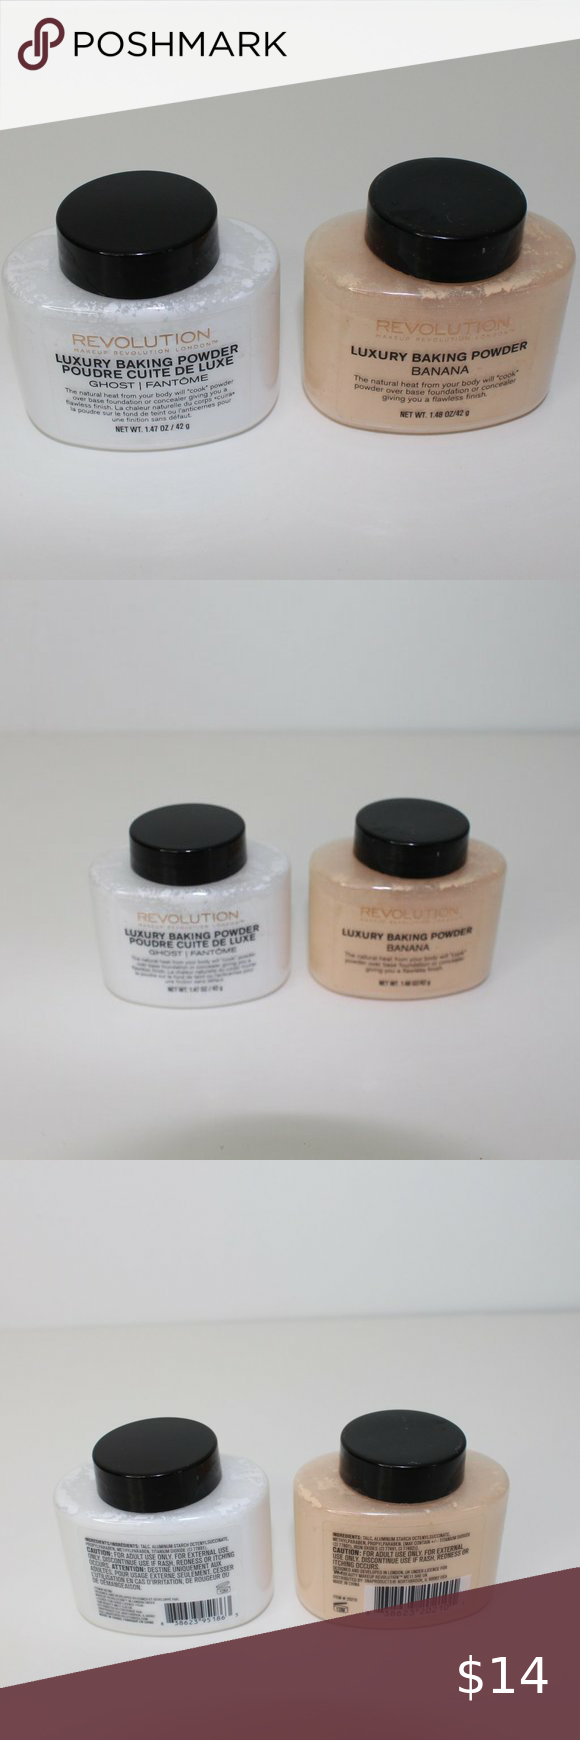 Makeup Revolution Luxury Baking Powder ( Set of 2) in 2020